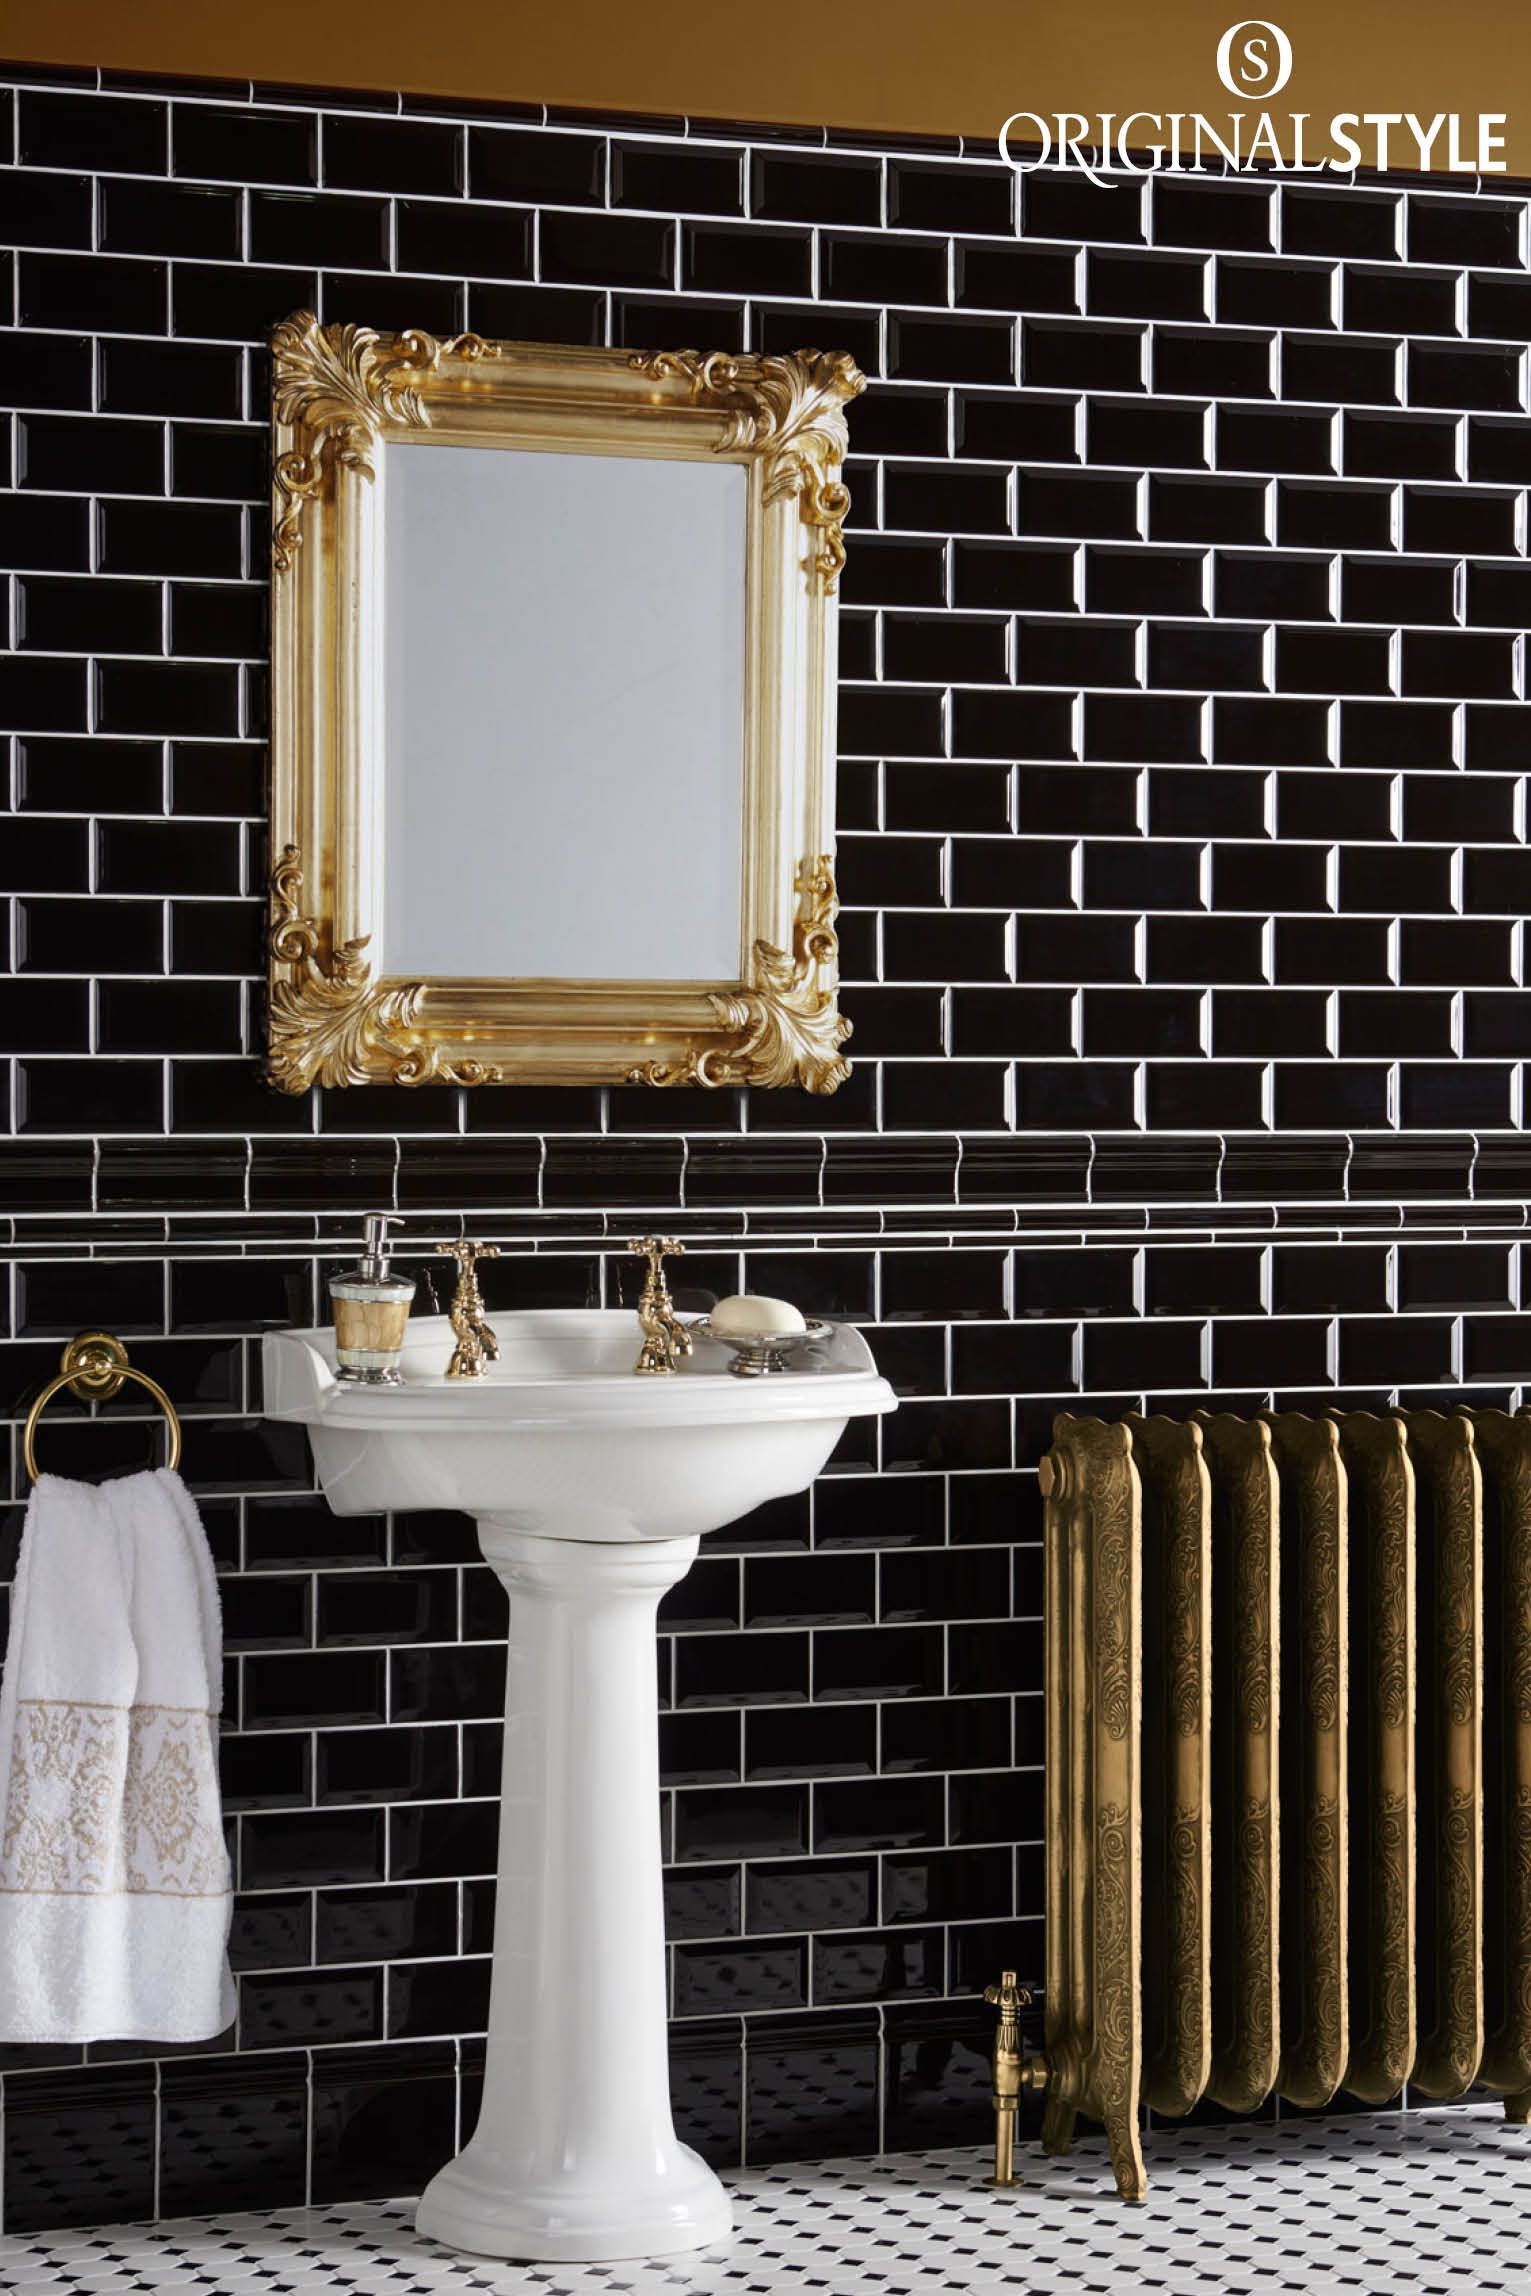 Windsor Blue Albert Moulding Tile Victorian Tiles Bathroom Black Tile Bathrooms Metro Tiles